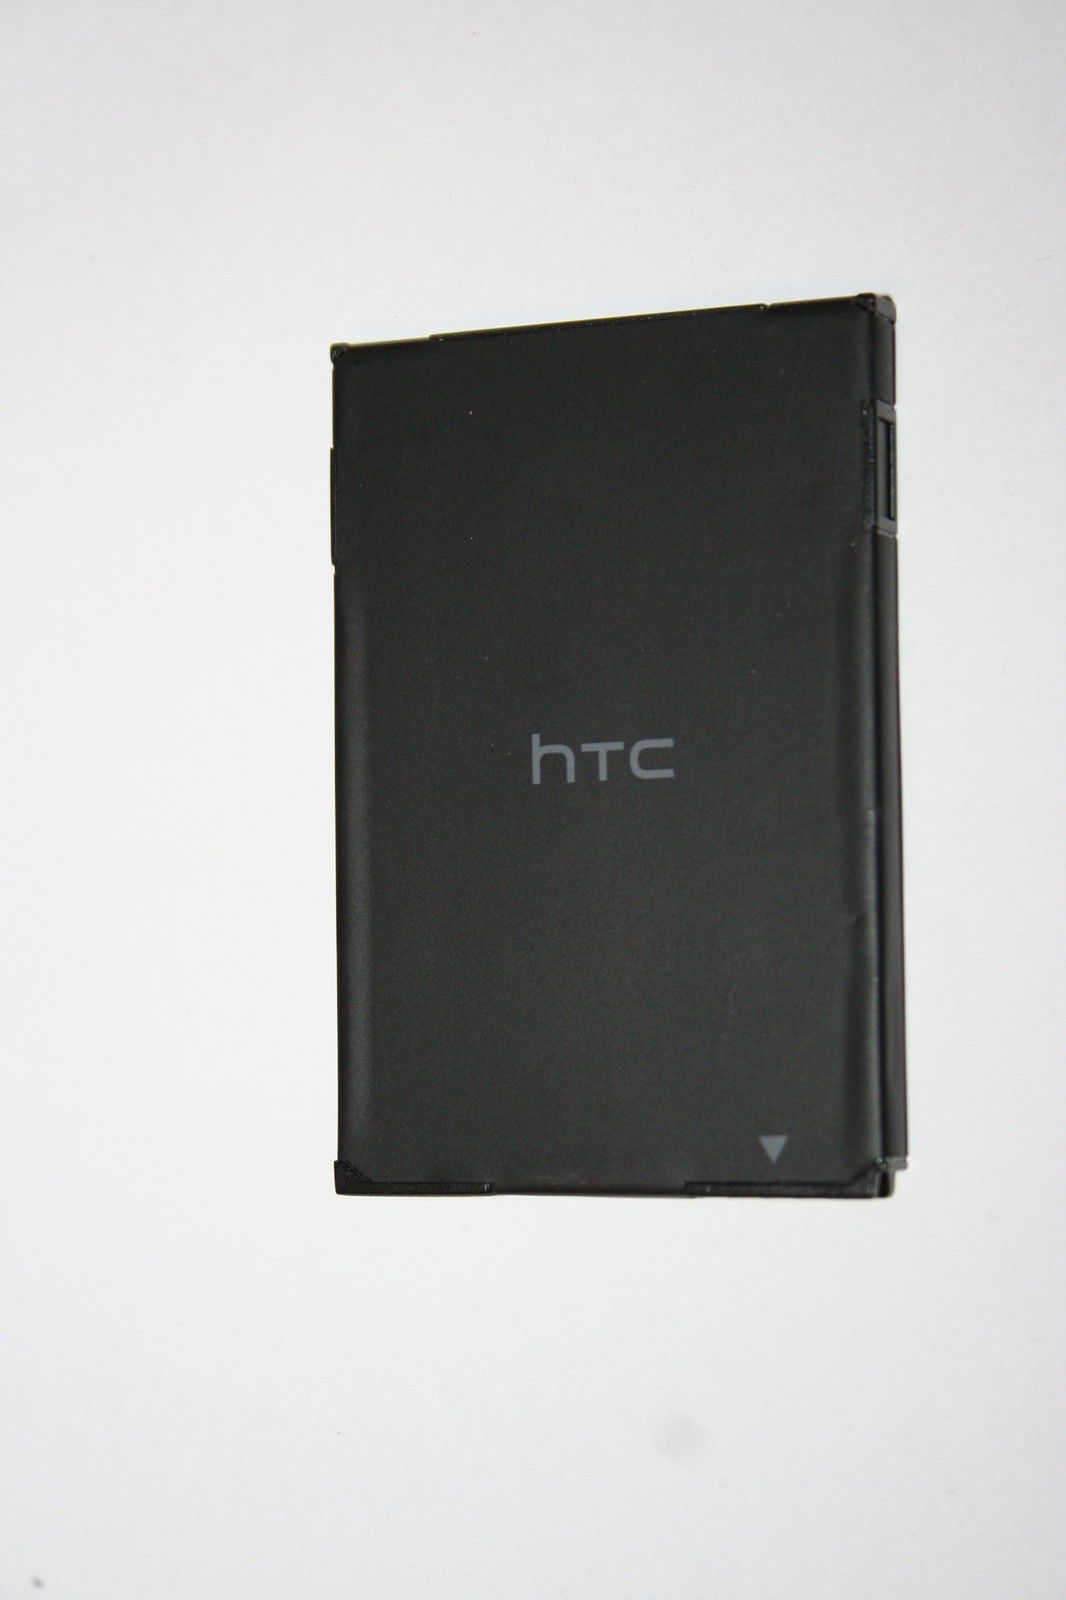 OEM Battery for HTC Evo Shift 4G Sprint RHOD160 1500mAh Part no. 35H00146-00M image 2